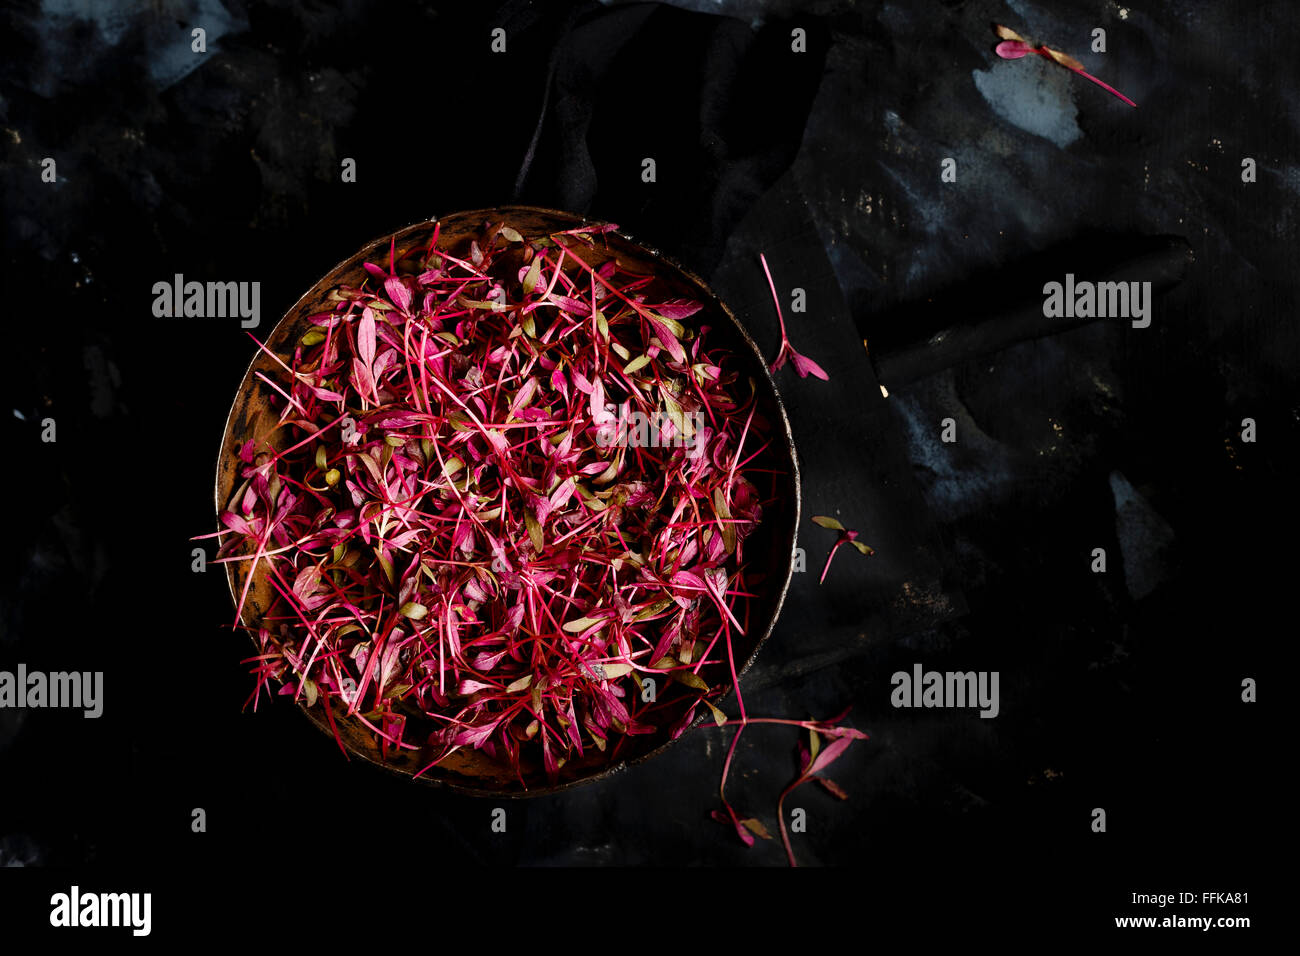 Micro Herbs - Amaranth Leaves - Stock Image